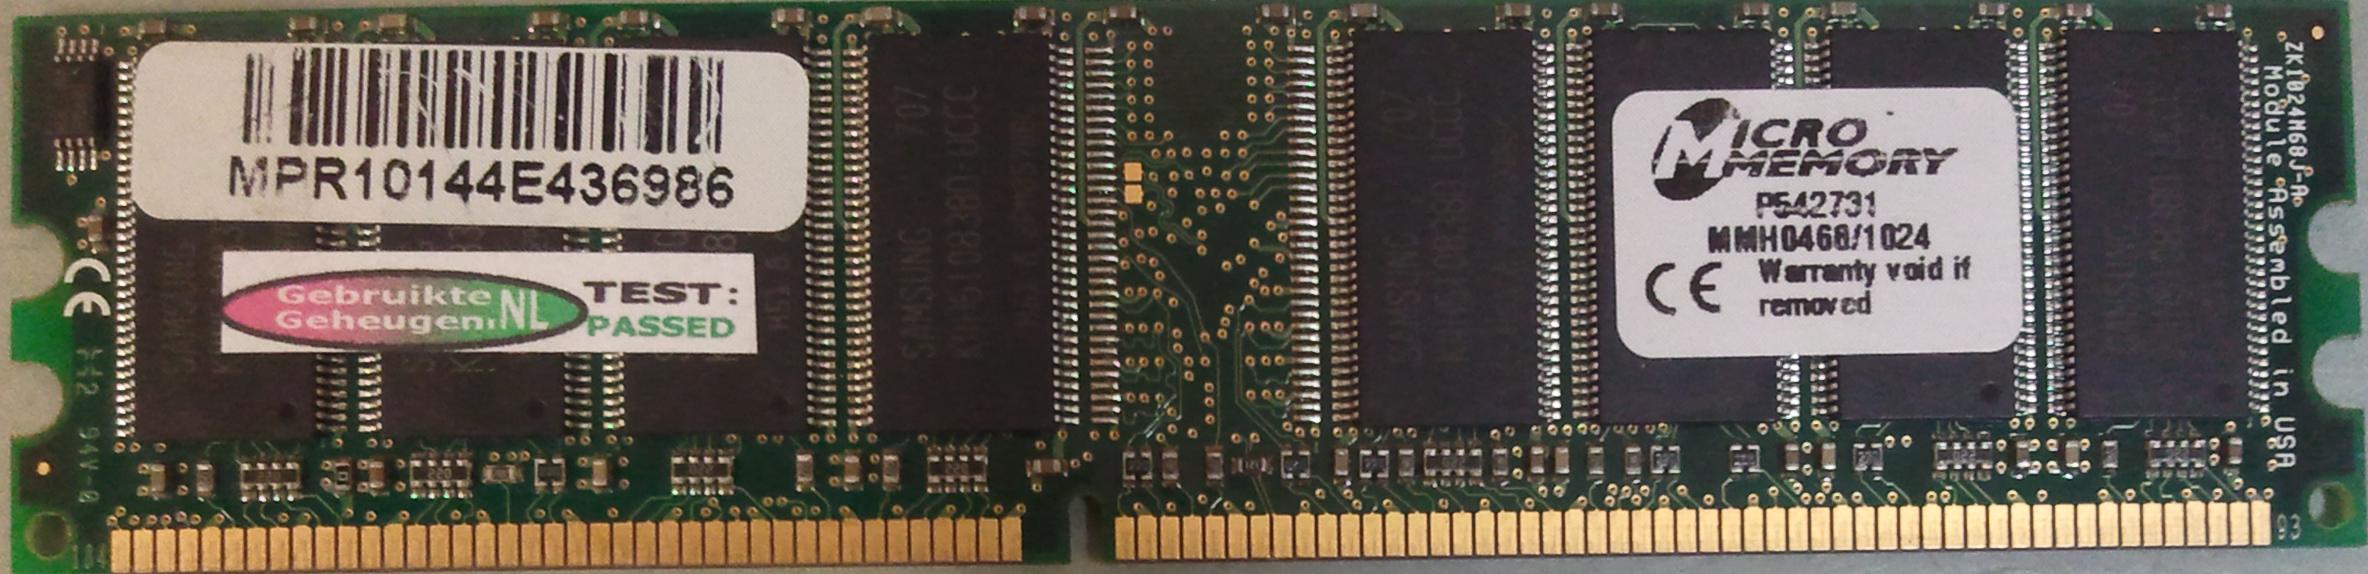 MicroMemory 1GB DDR PC3200U 400MHz